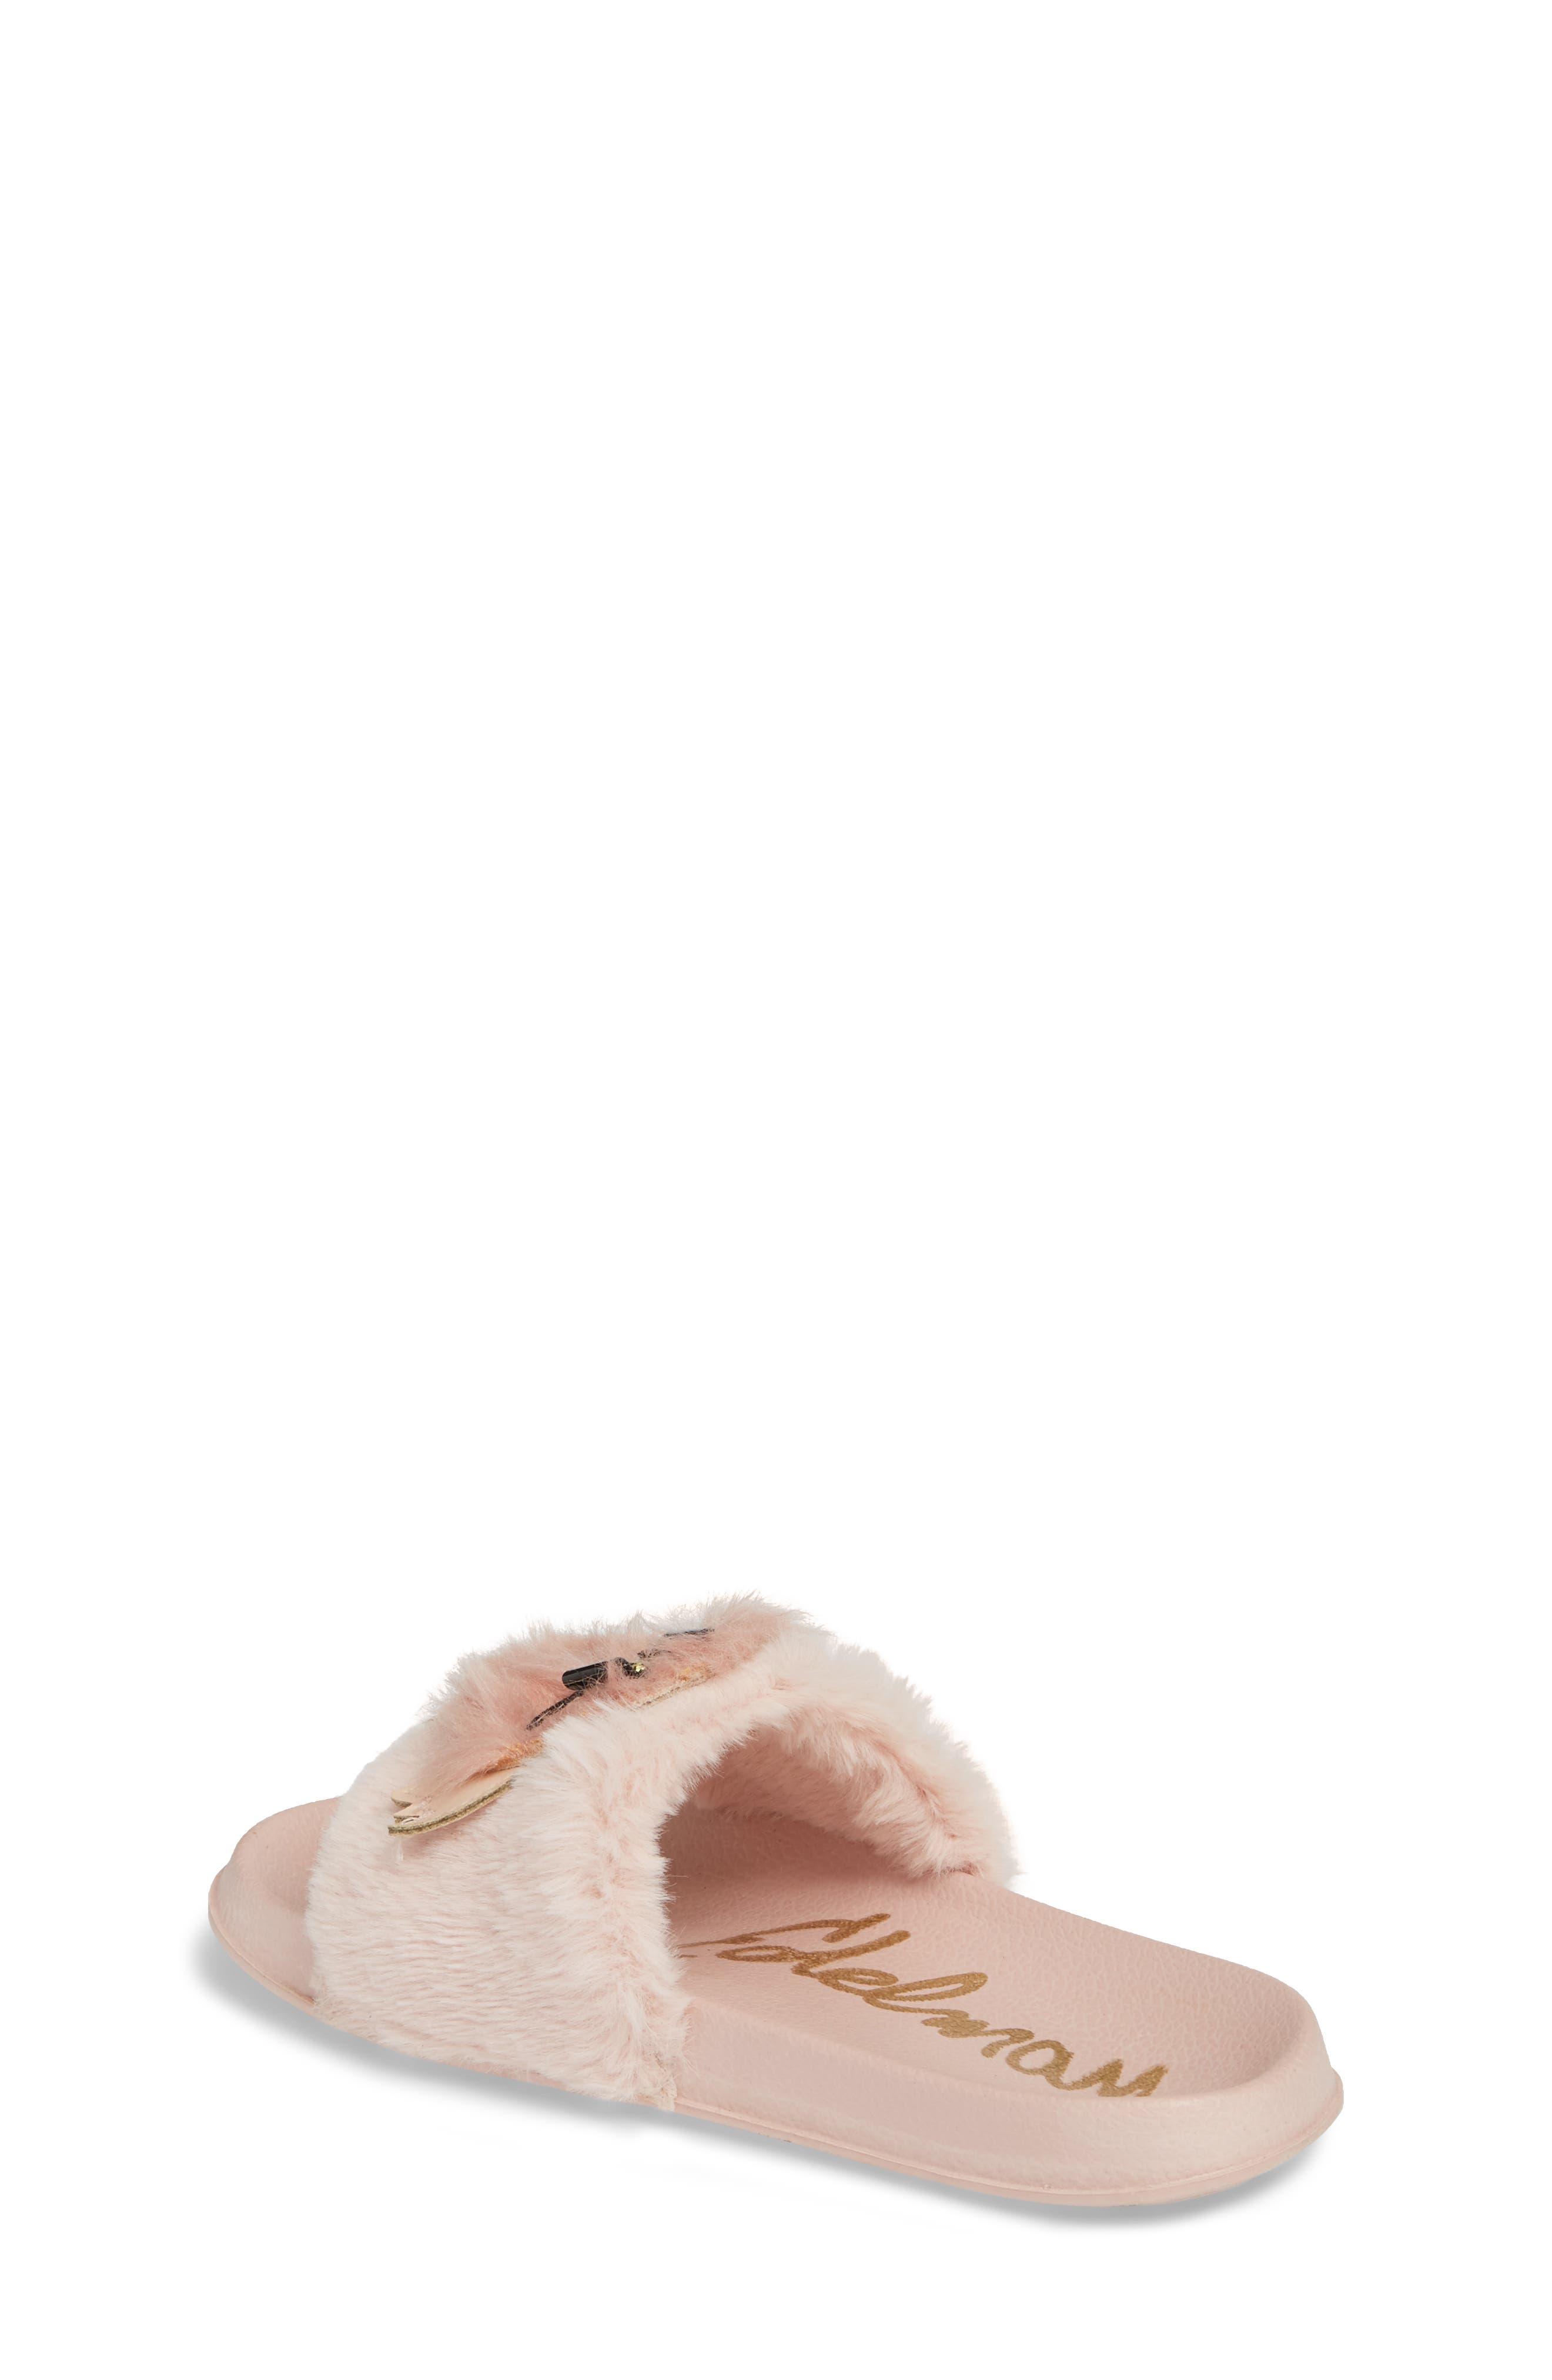 Mackie Furry Faux Fur Slide Sandal,                             Alternate thumbnail 2, color,                             Blush Faux Fur